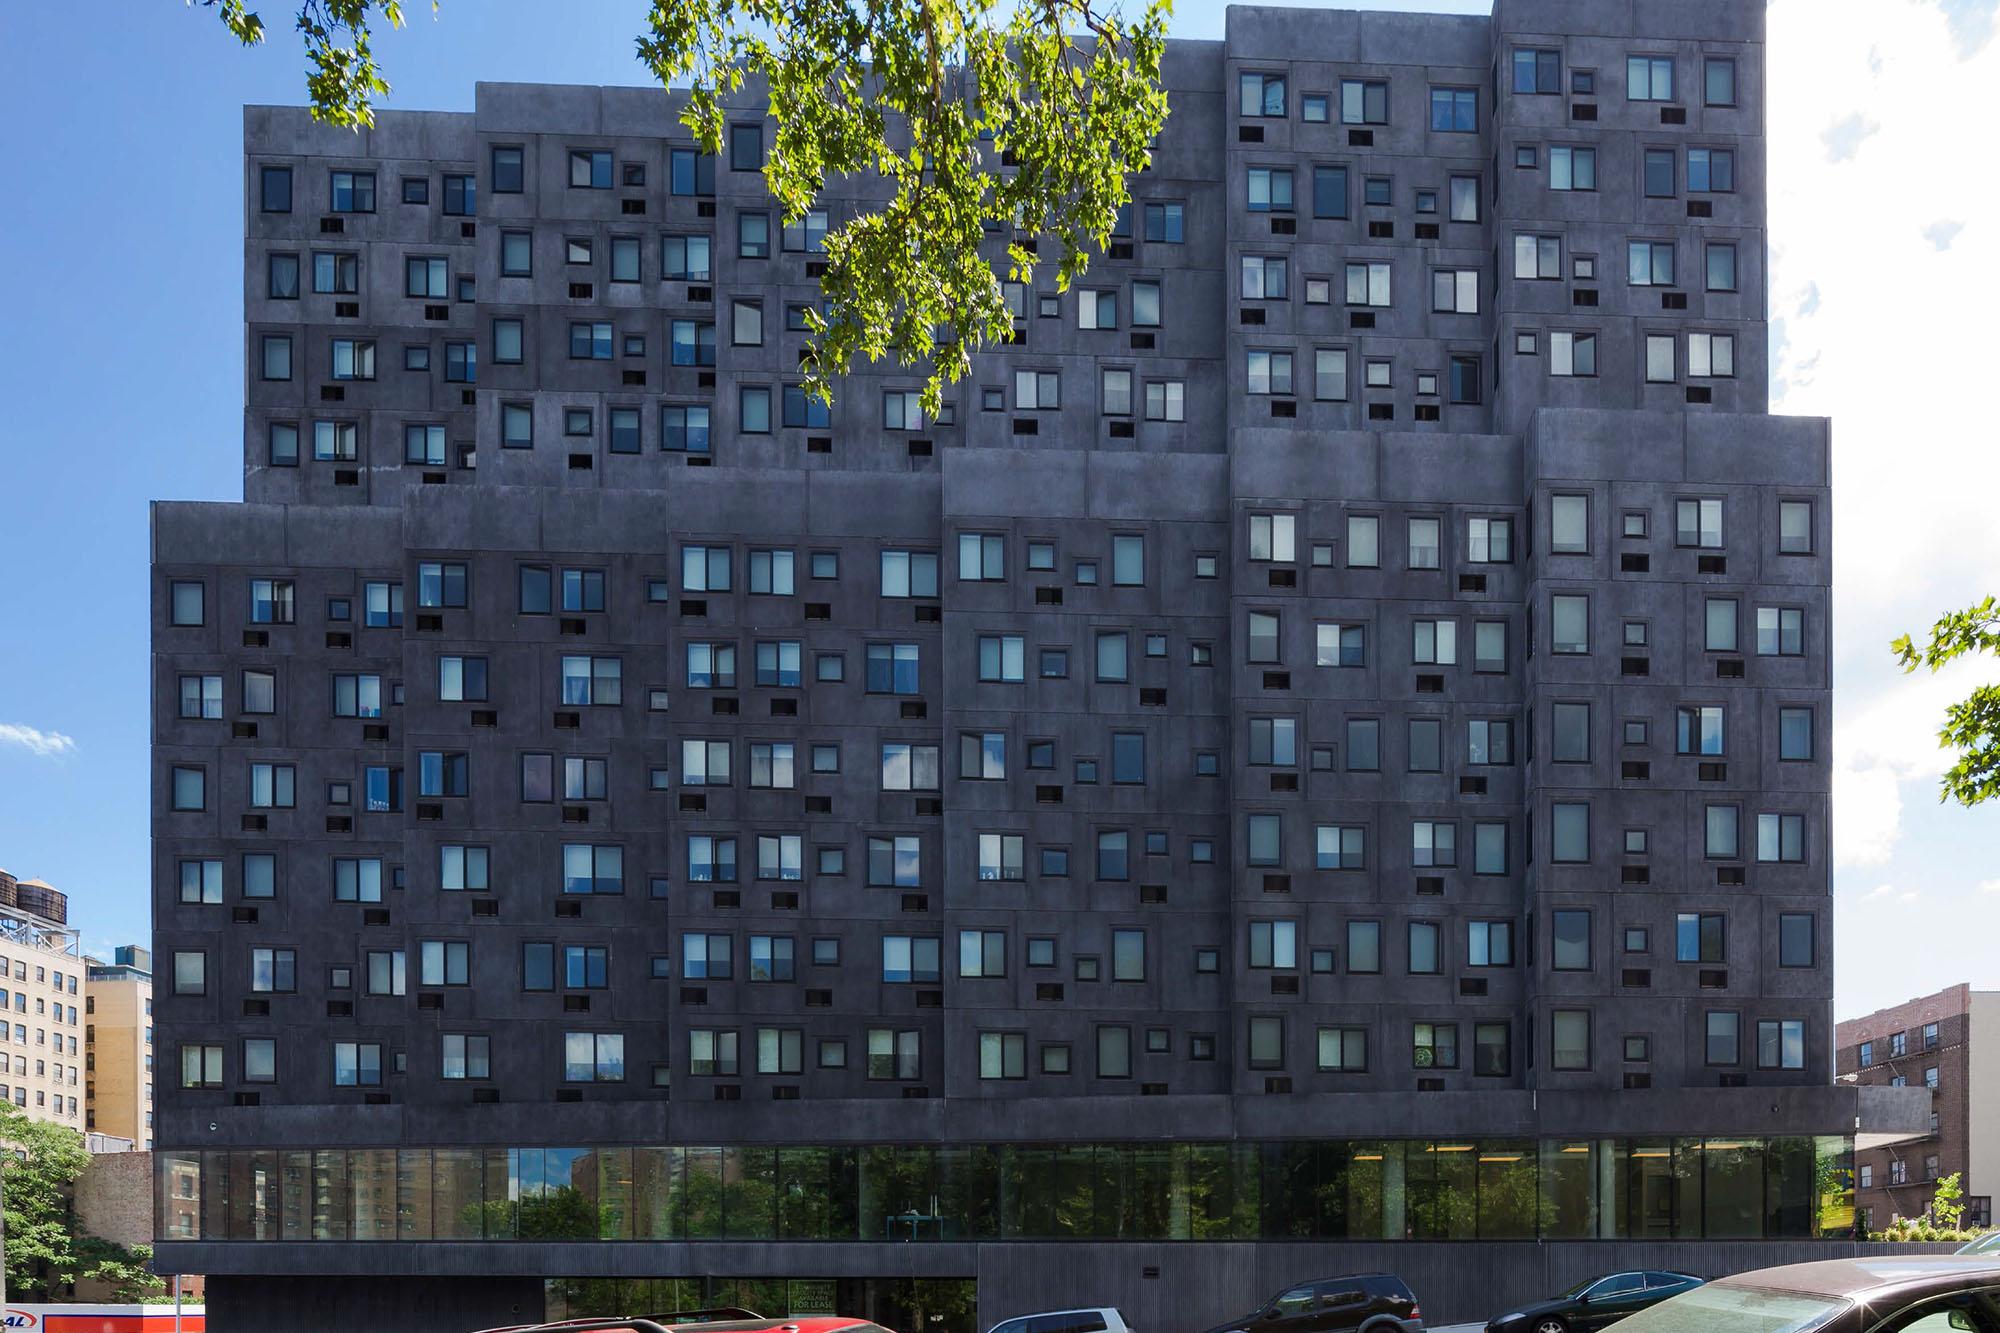 Sugar Hill Housing | Architect Magazine | Adjaye Associates, SLCE Architects,  New York, NY, Mixed Use, New Construction, 2016 AIA New York Design Awards,  ...